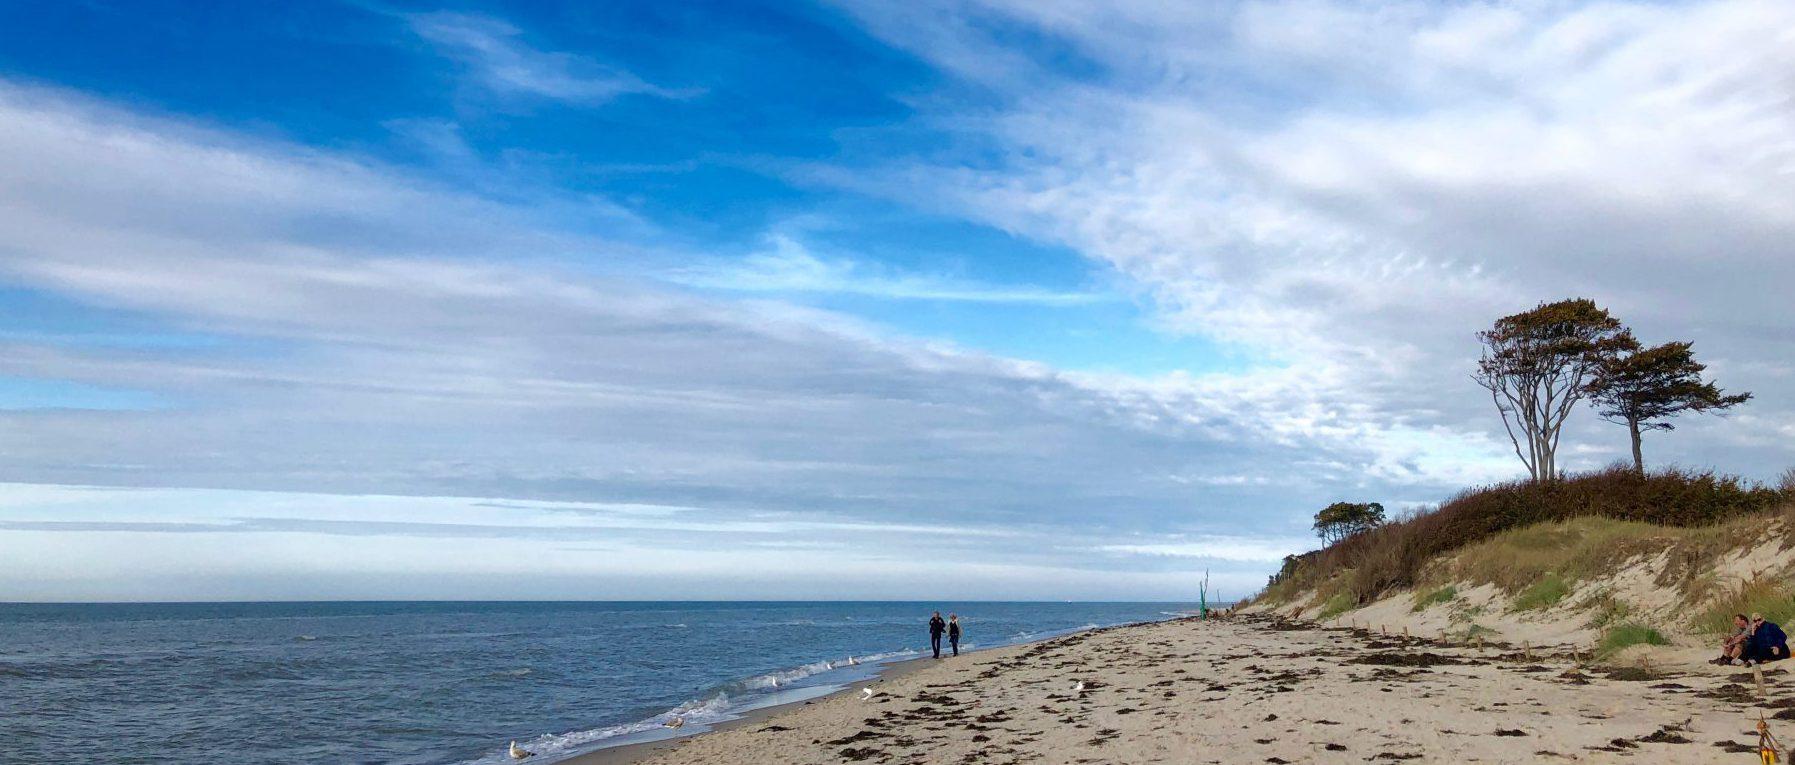 Strandspaziergang Weststrand Darss